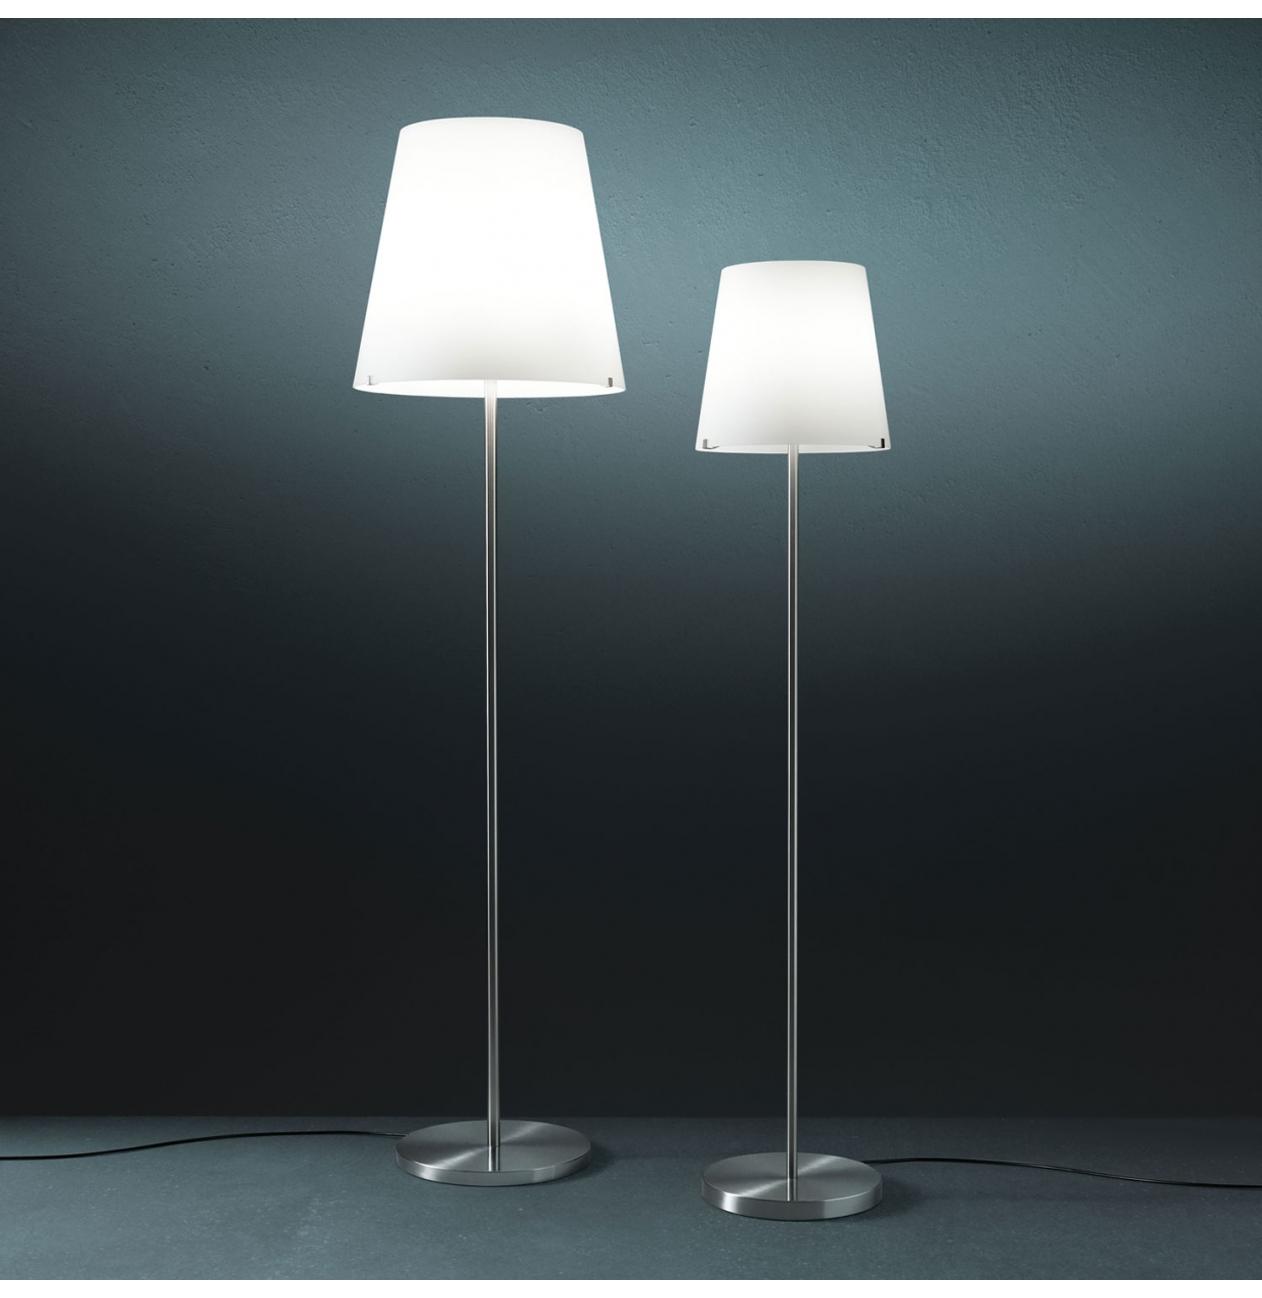 fontana arte vloerlamp 3247 versteeg lichtstudio. Black Bedroom Furniture Sets. Home Design Ideas